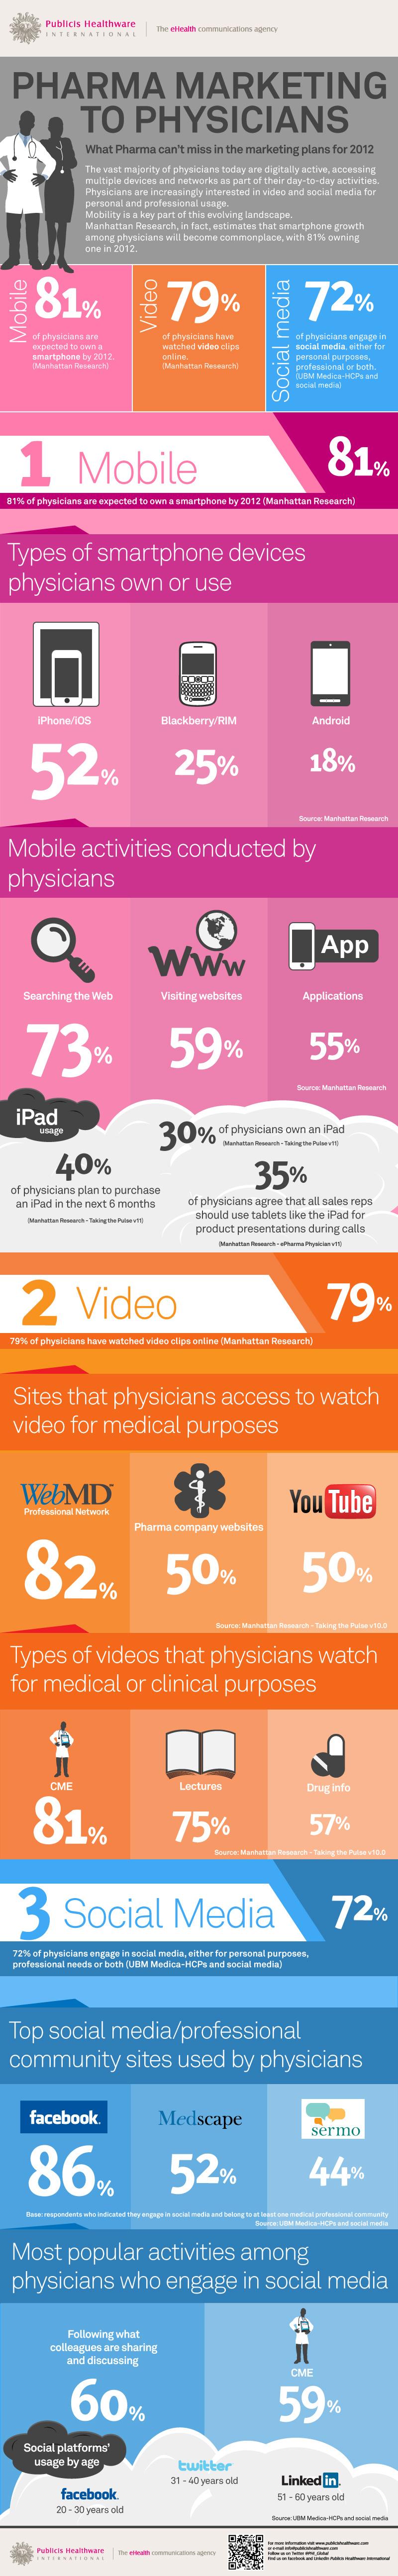 Pharma marketing to physicians